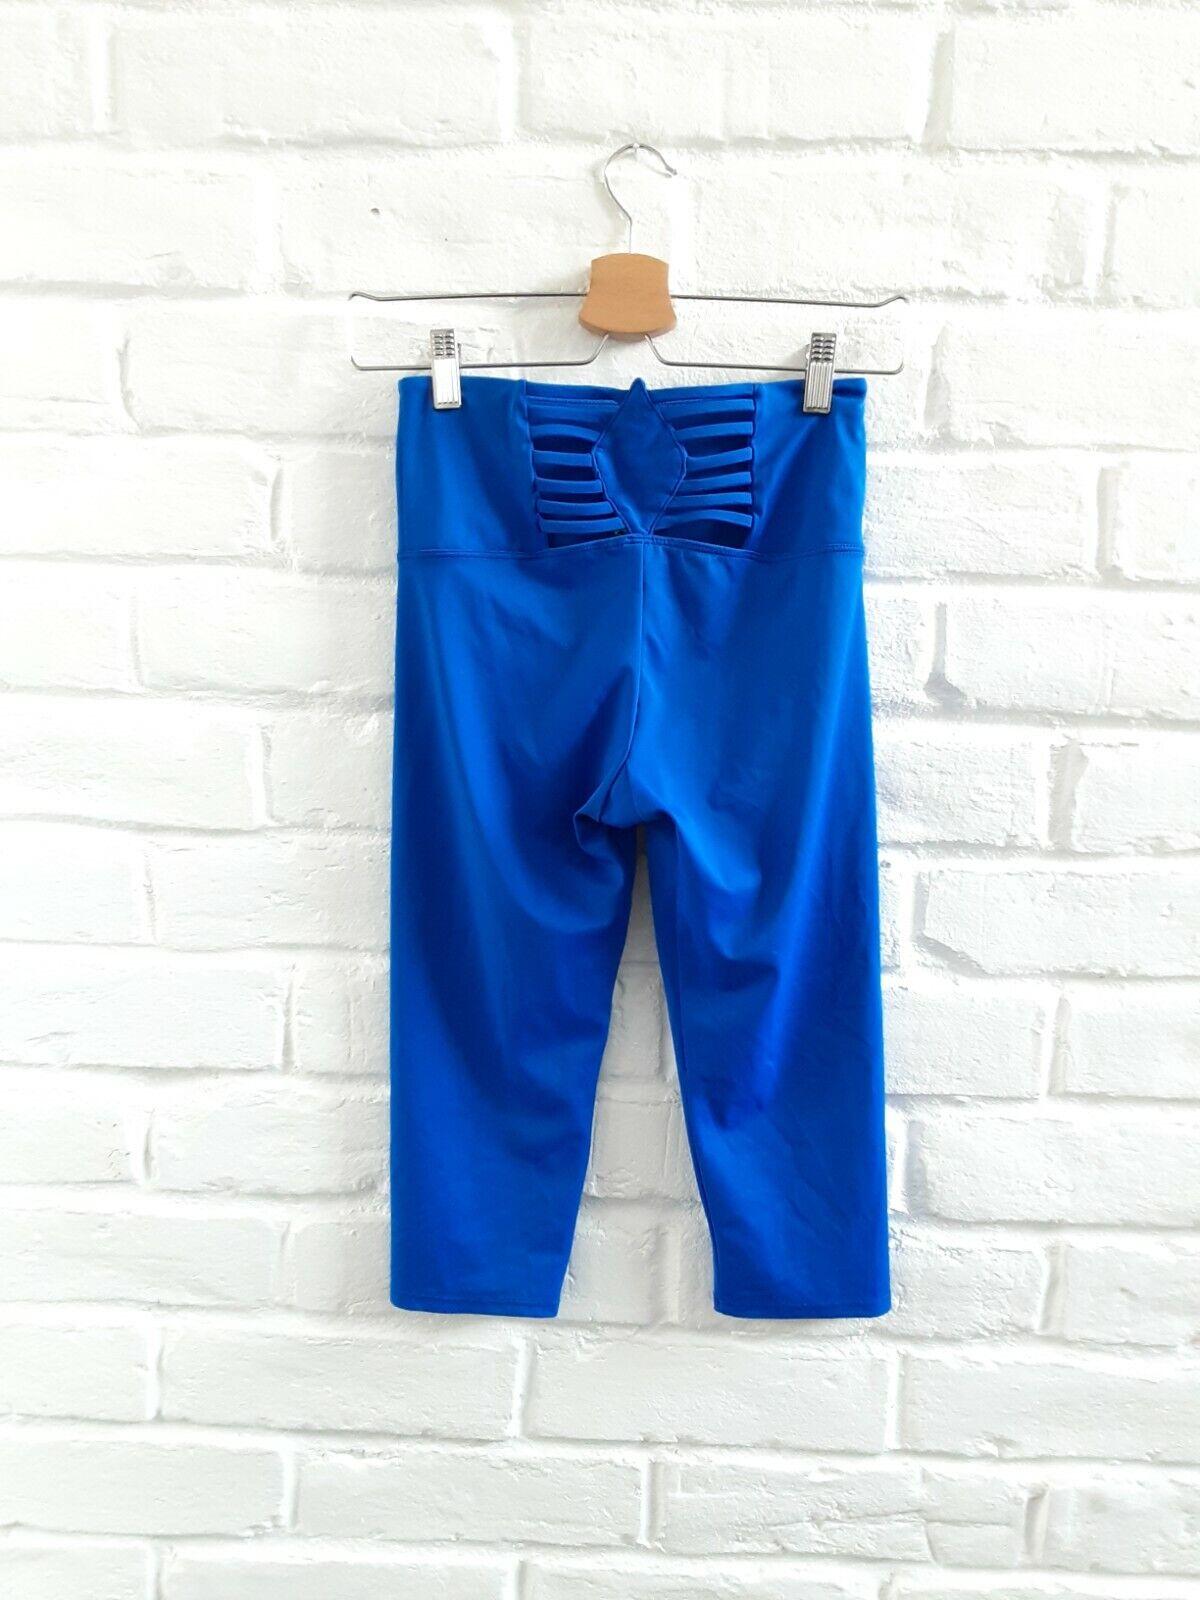 Onzie Blue Yoga Capri Workout Athletic Pants Leggings High Waist Activewear XS